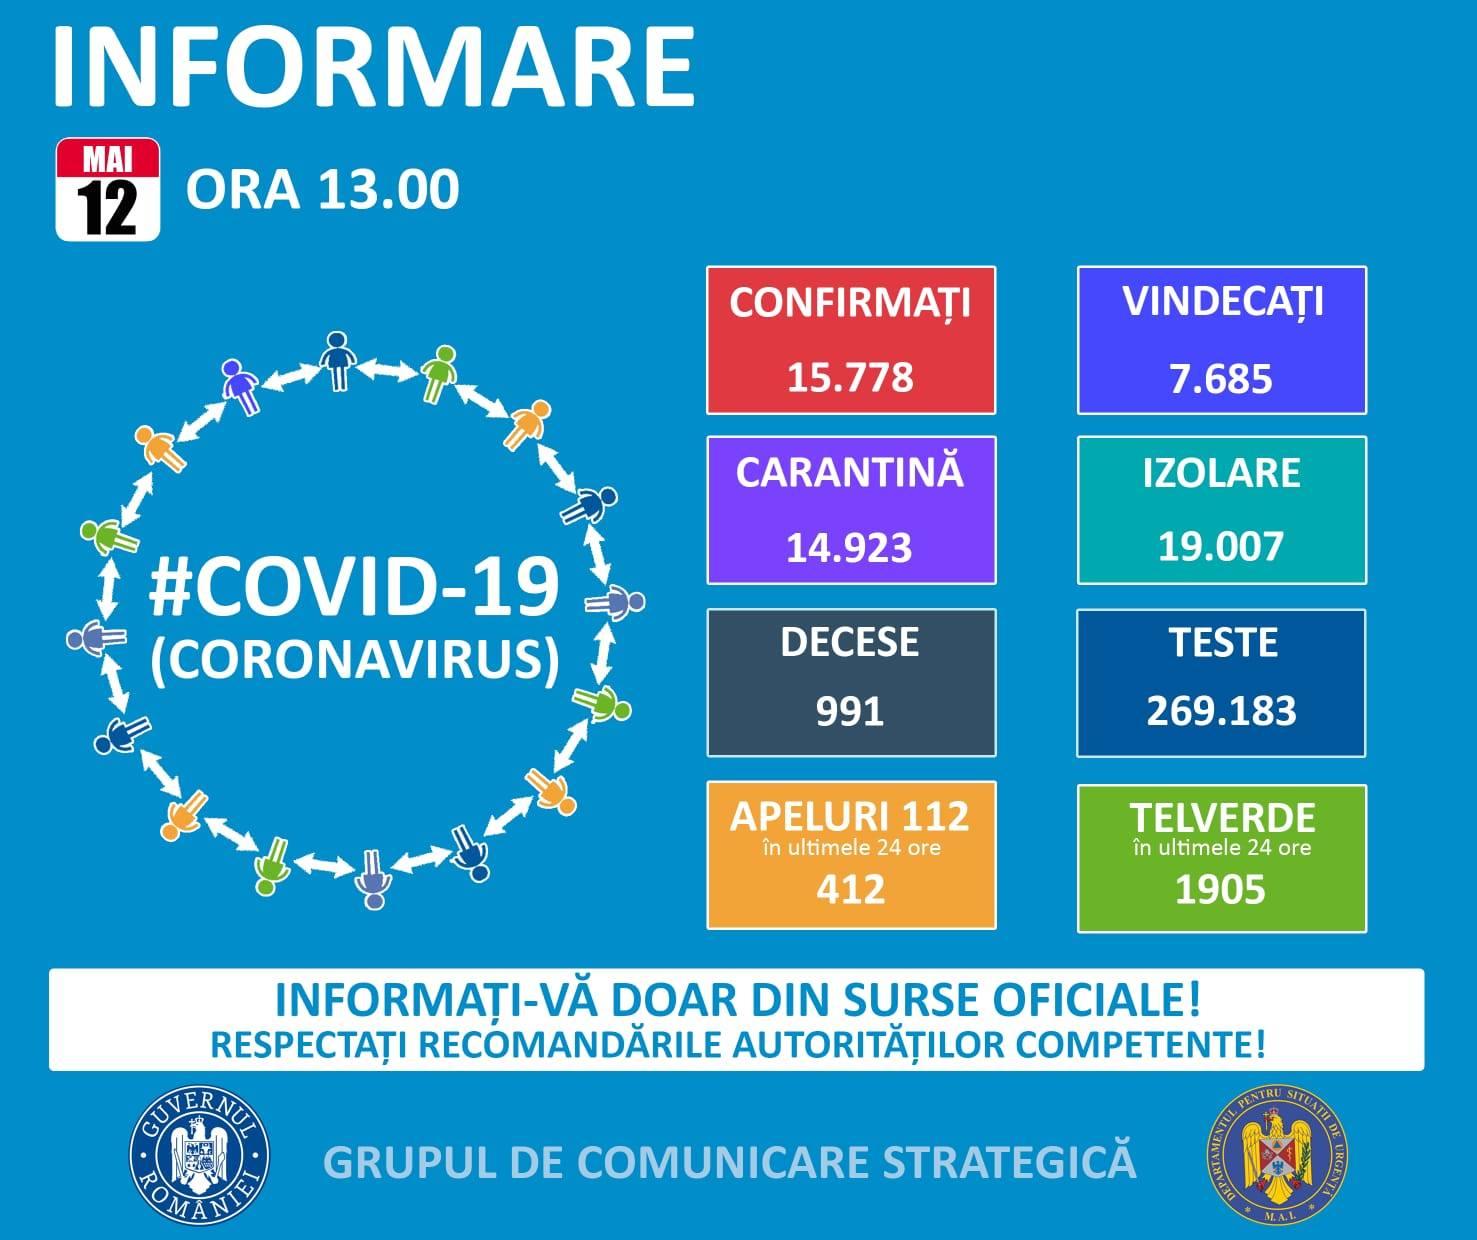 Coronavirus Romania situatie 12 mai 2020